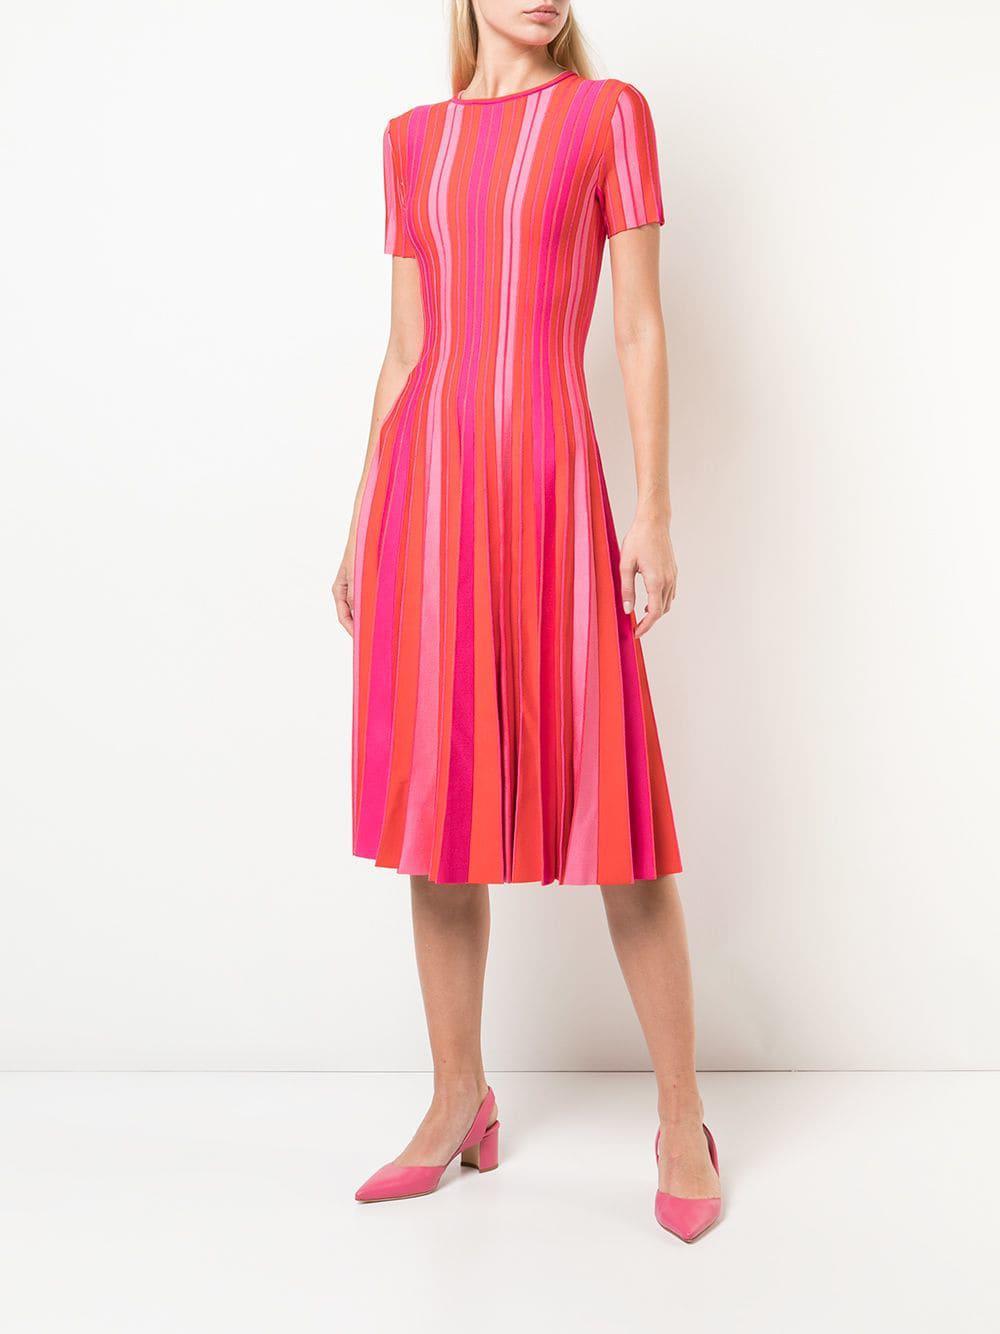 0849047d052 Lyst - Carolina Herrera Pleated Striped Dress in Pink